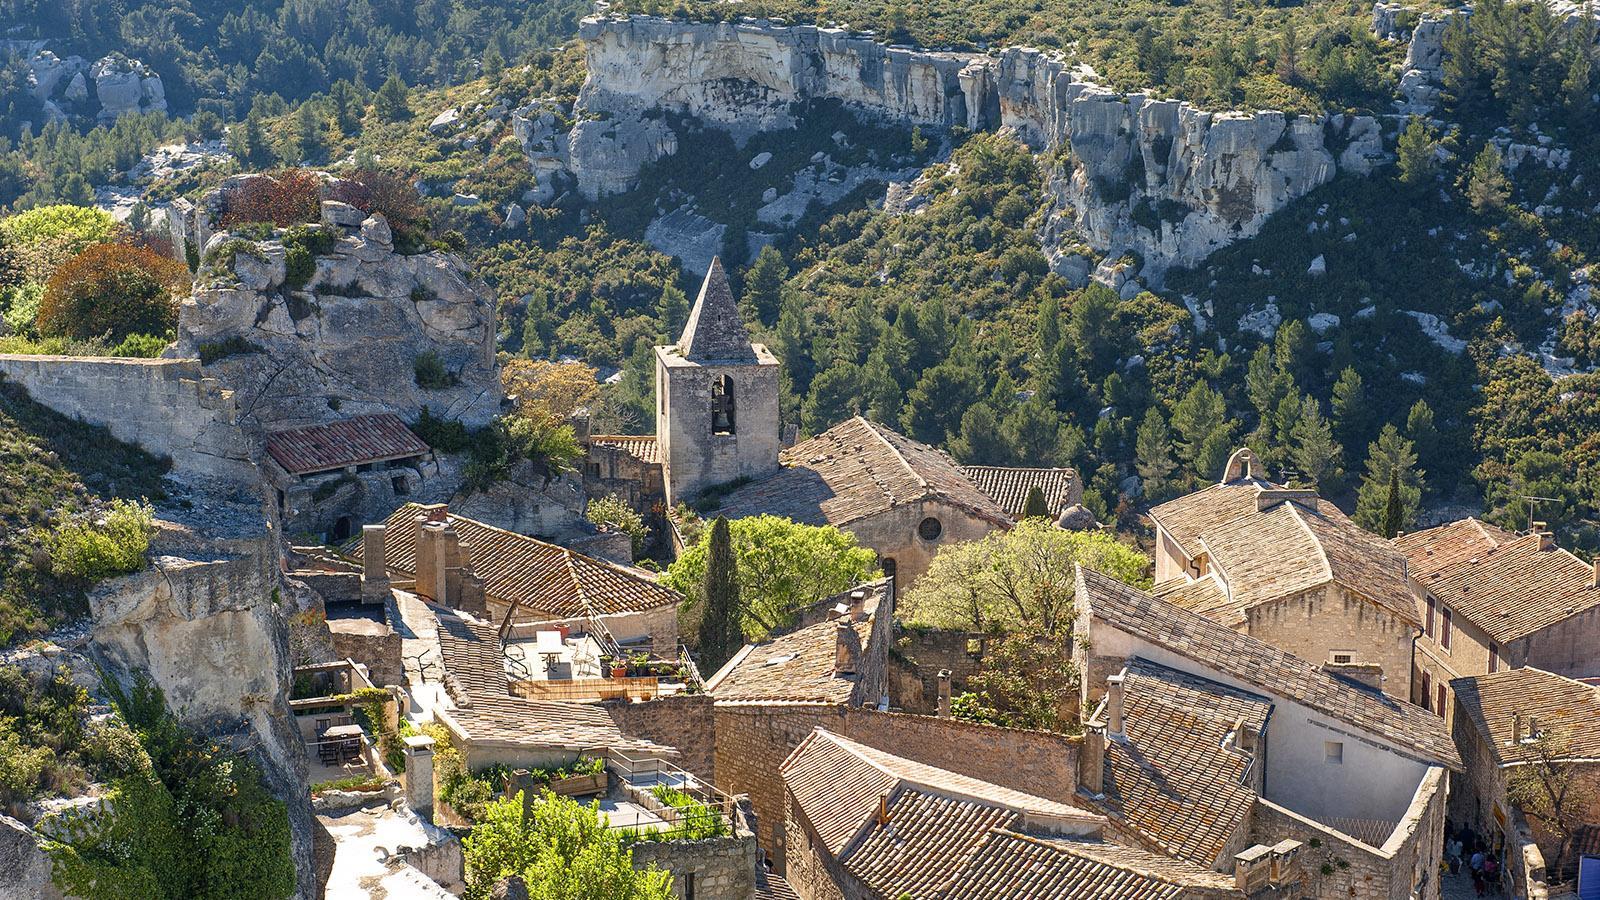 Les Baux-de-Provence gehört zu den schönsten Dörfern Frankreichs